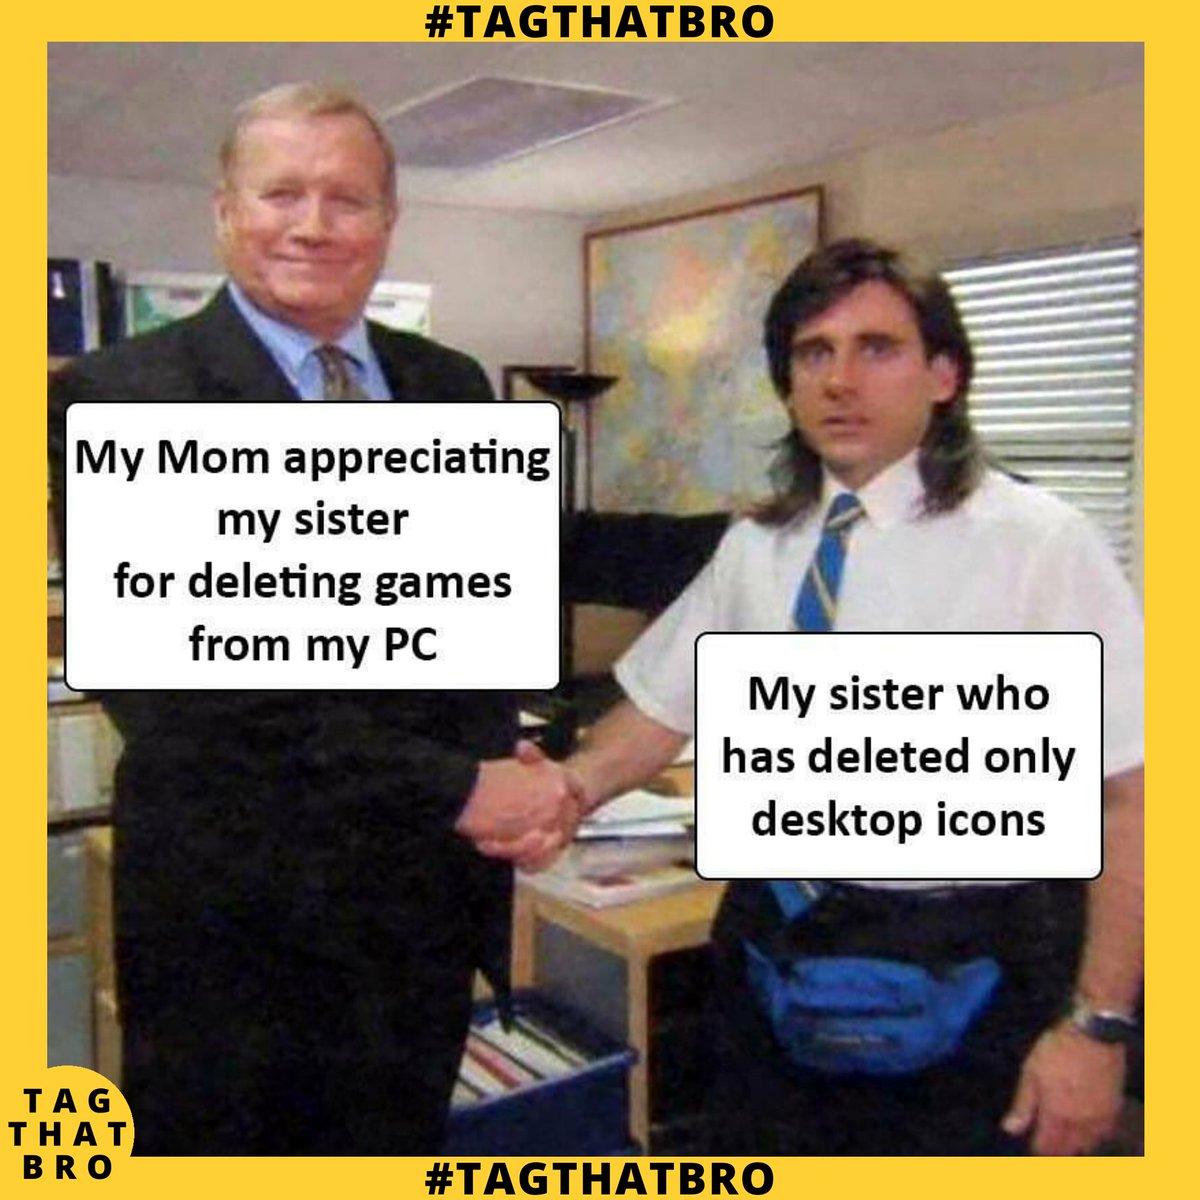 Tag That Bro - Follow us @tagthatbro  #tagthatbro #memes#dankmemes #memes#memesdaily #memesespanol #memestagram #funnymemes #edgymemes #memester #memesdank #memesfordays #memeschile #memesfunny #dailymemes #memess #memestar #memestagram #memesrlife #memesquadpic.twitter.com/lGujB1NNHq